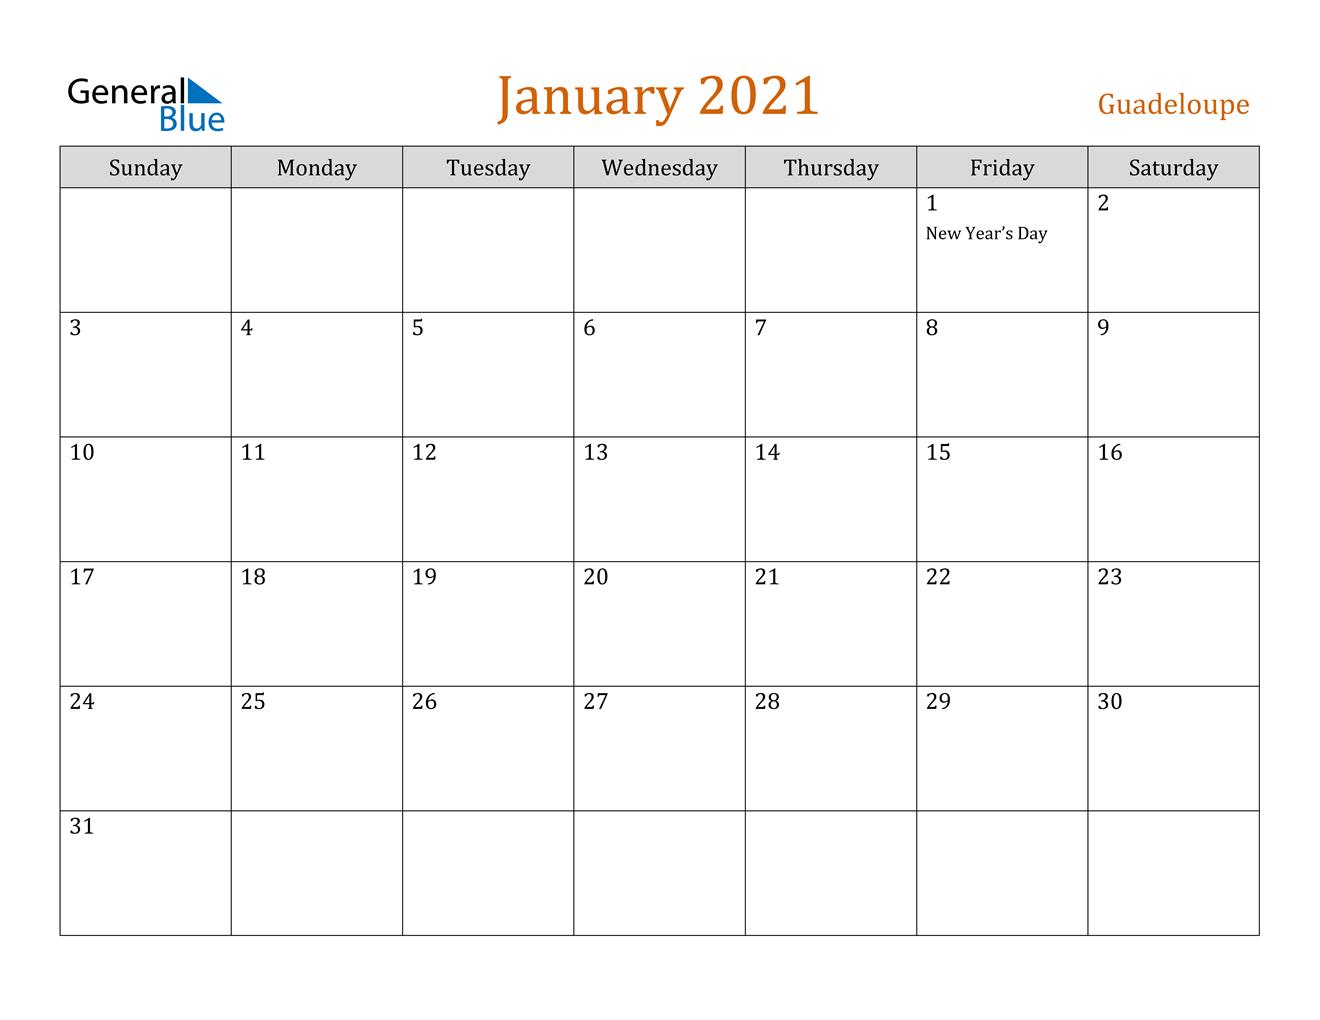 January 2021 Calendar - Guadeloupe